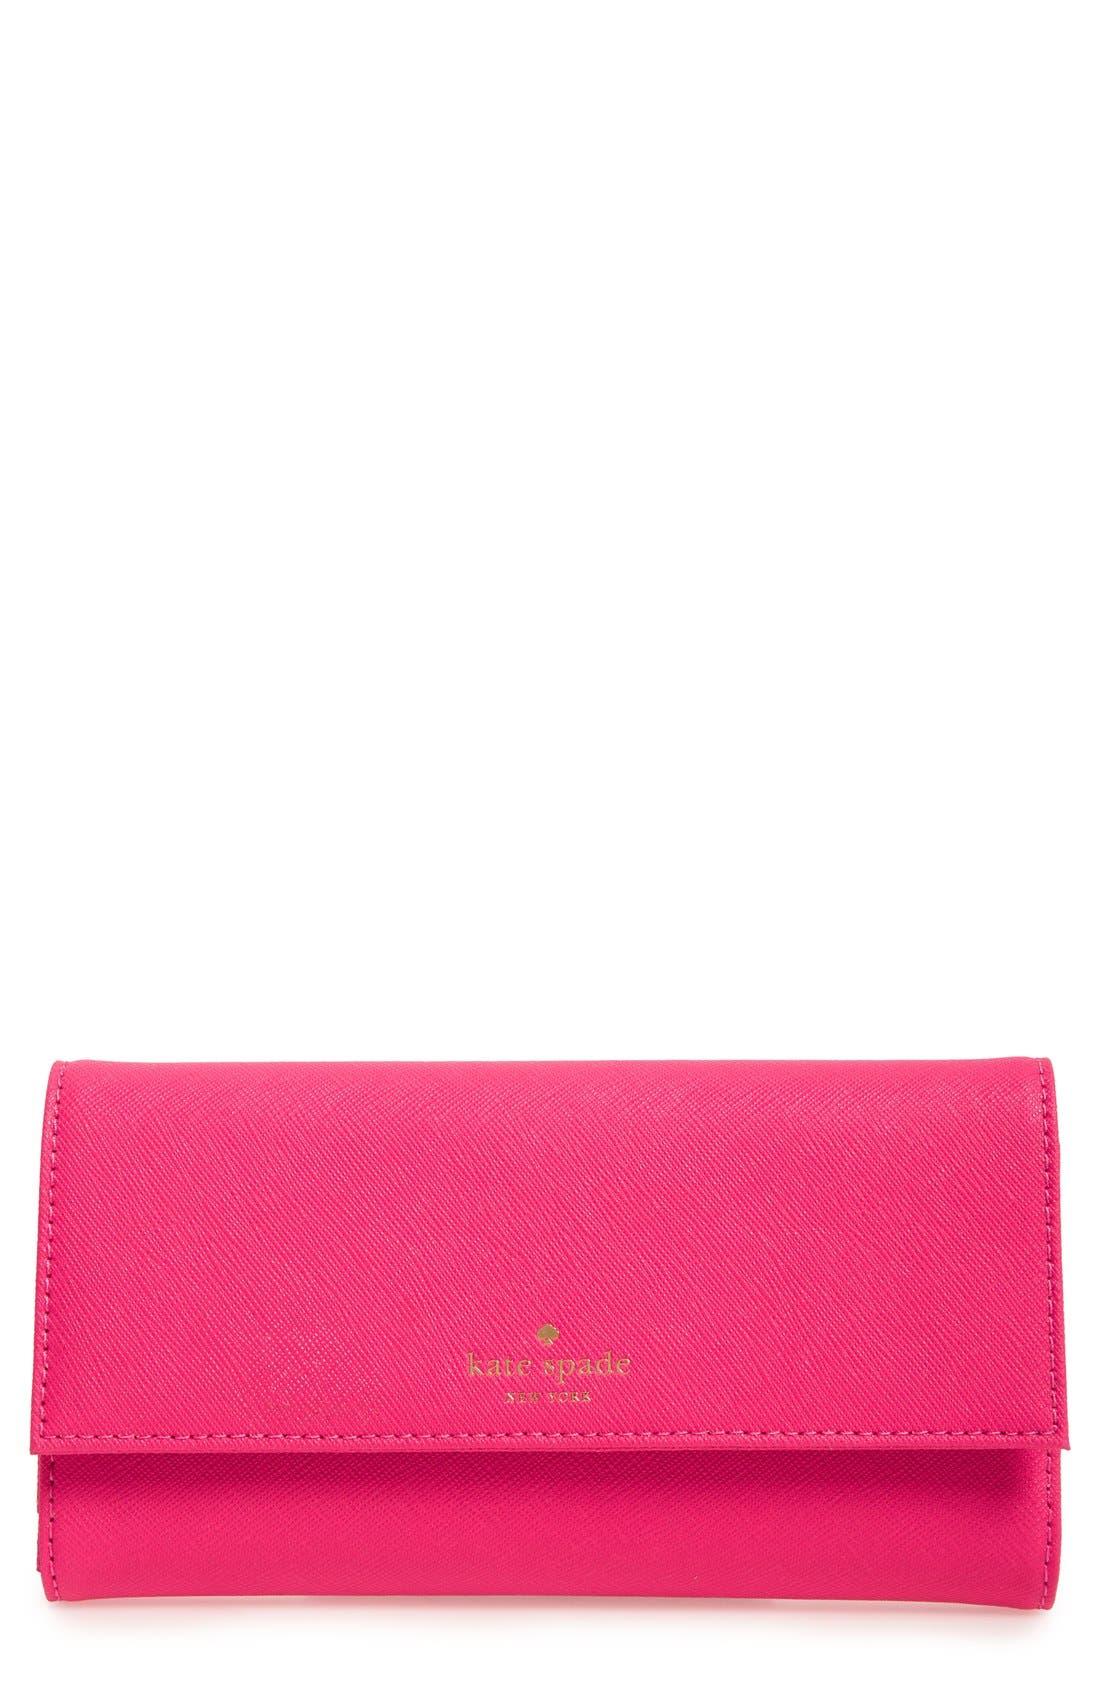 leather iPhone 7/8 & 7/8 Plus case,                             Main thumbnail 7, color,